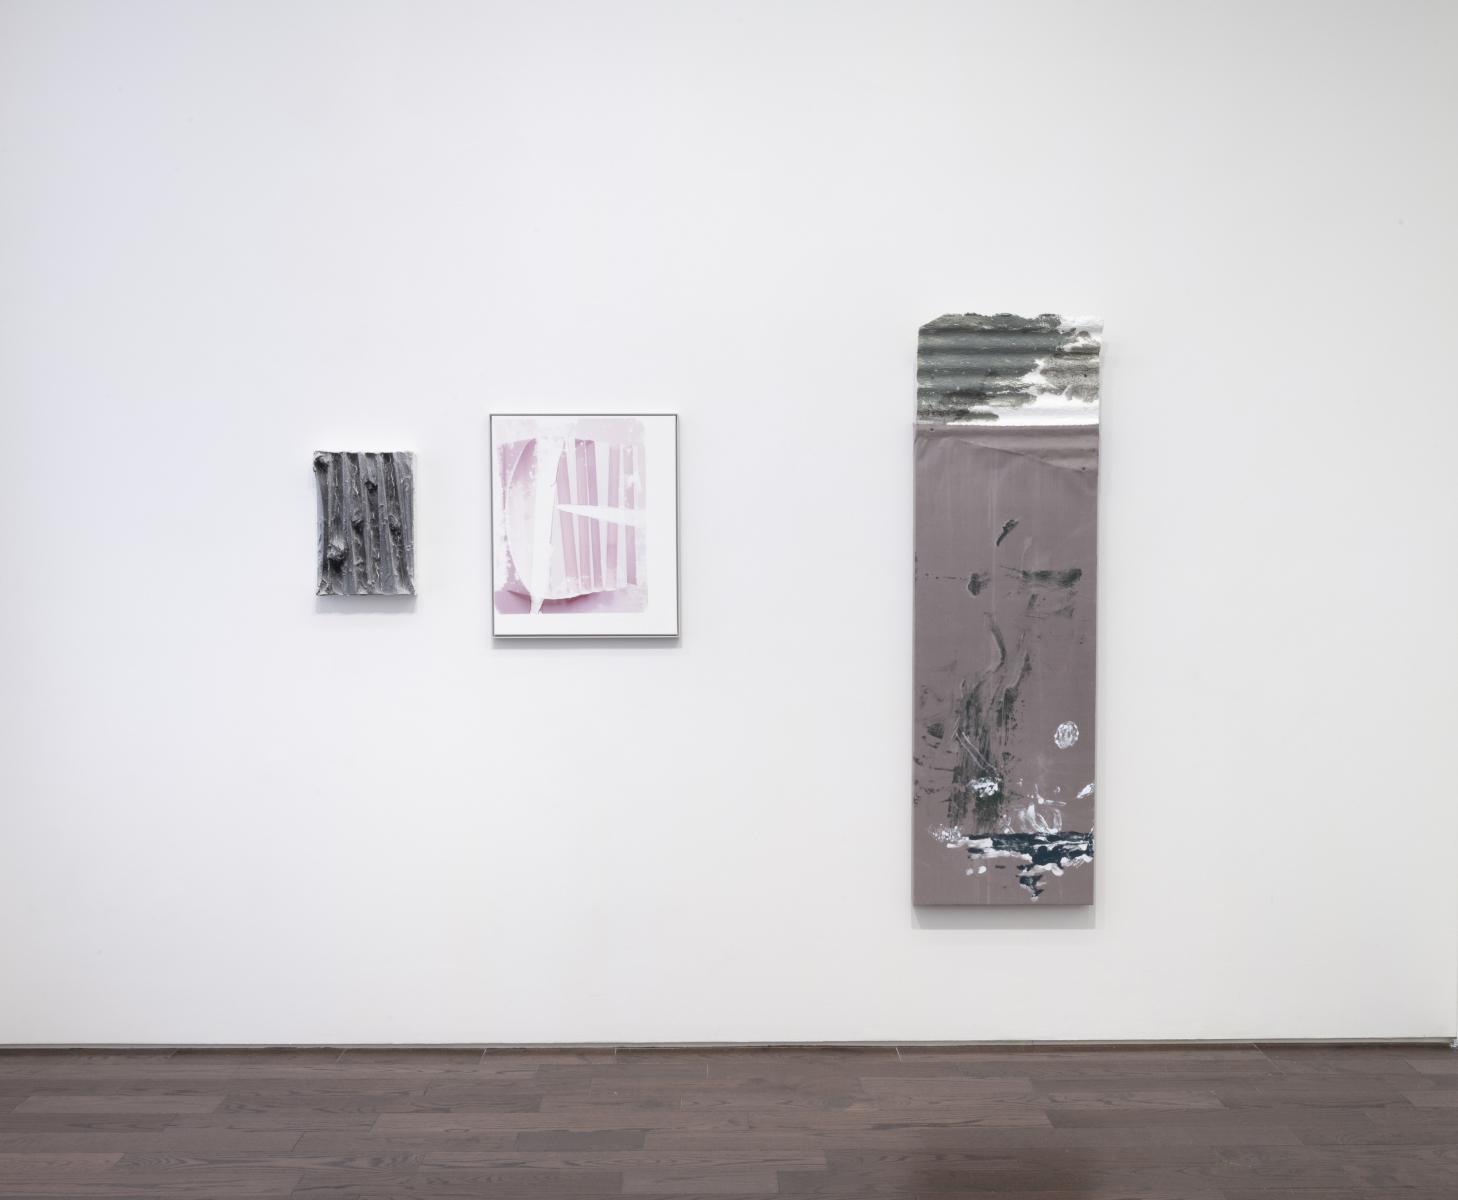 Exhibition View Wrecked Angle Ceysson & Bénétière New York 2021 (11)